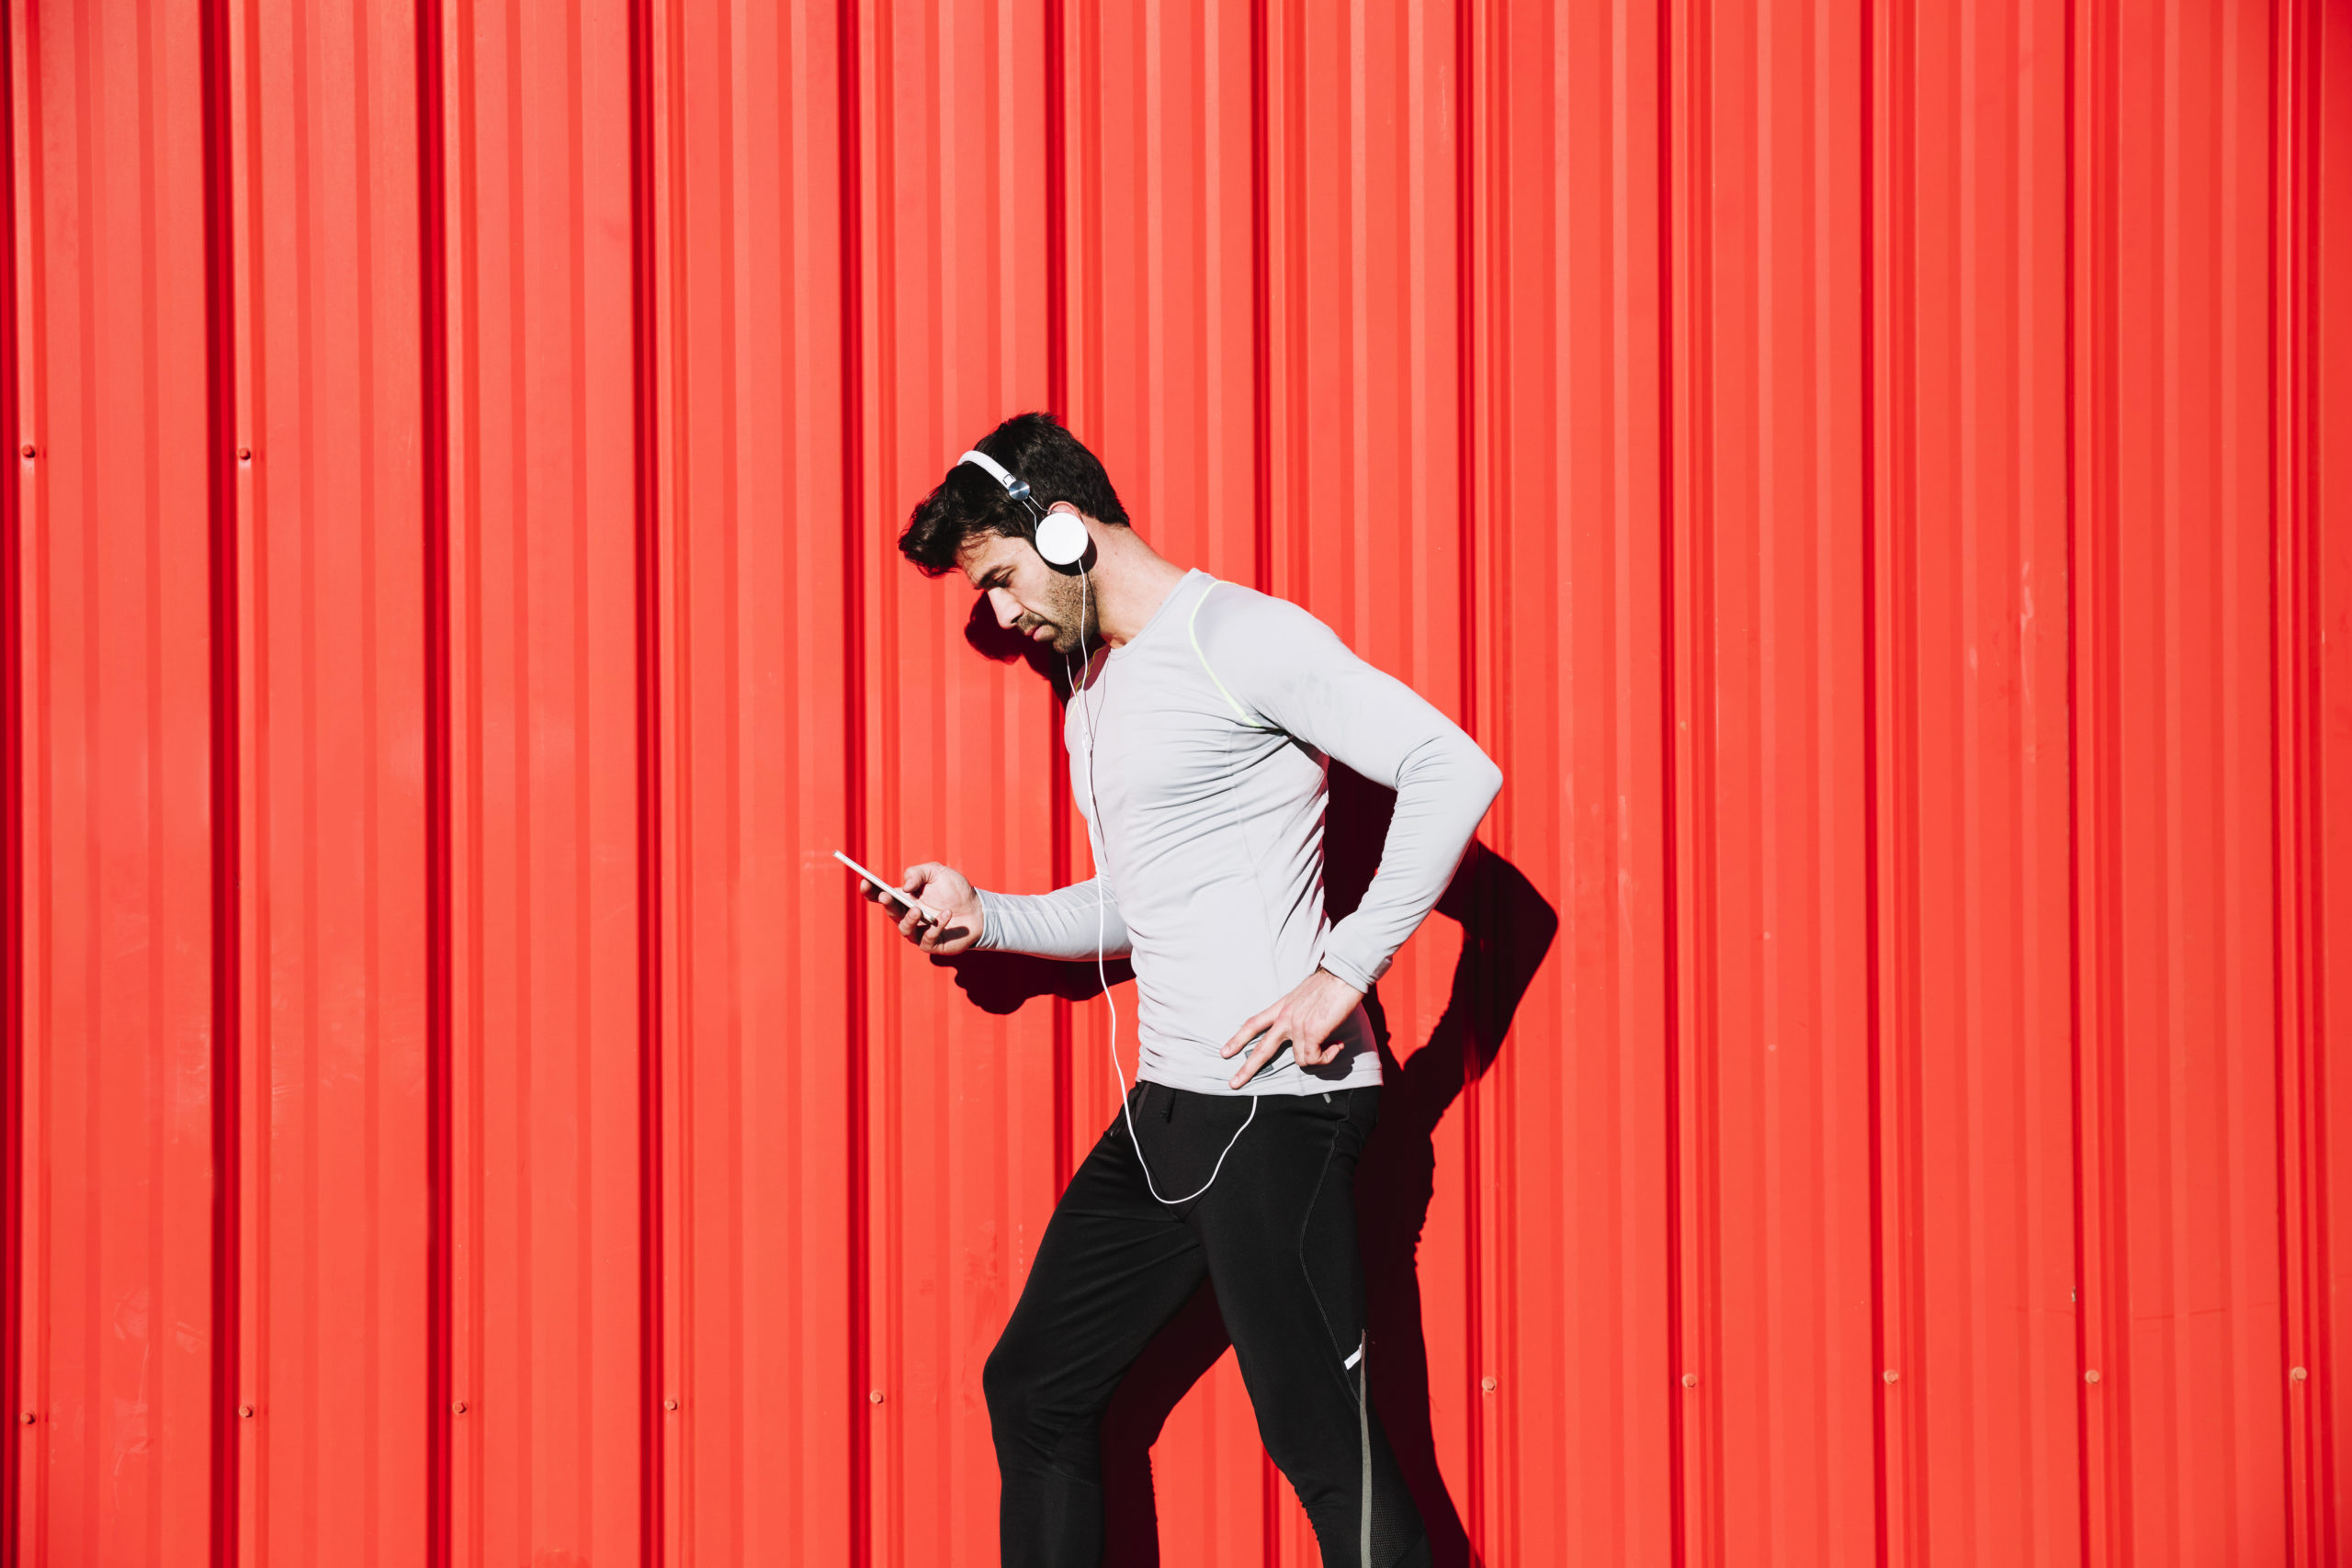 Millennial: 8 Technology Etiquette's You Should Relearn